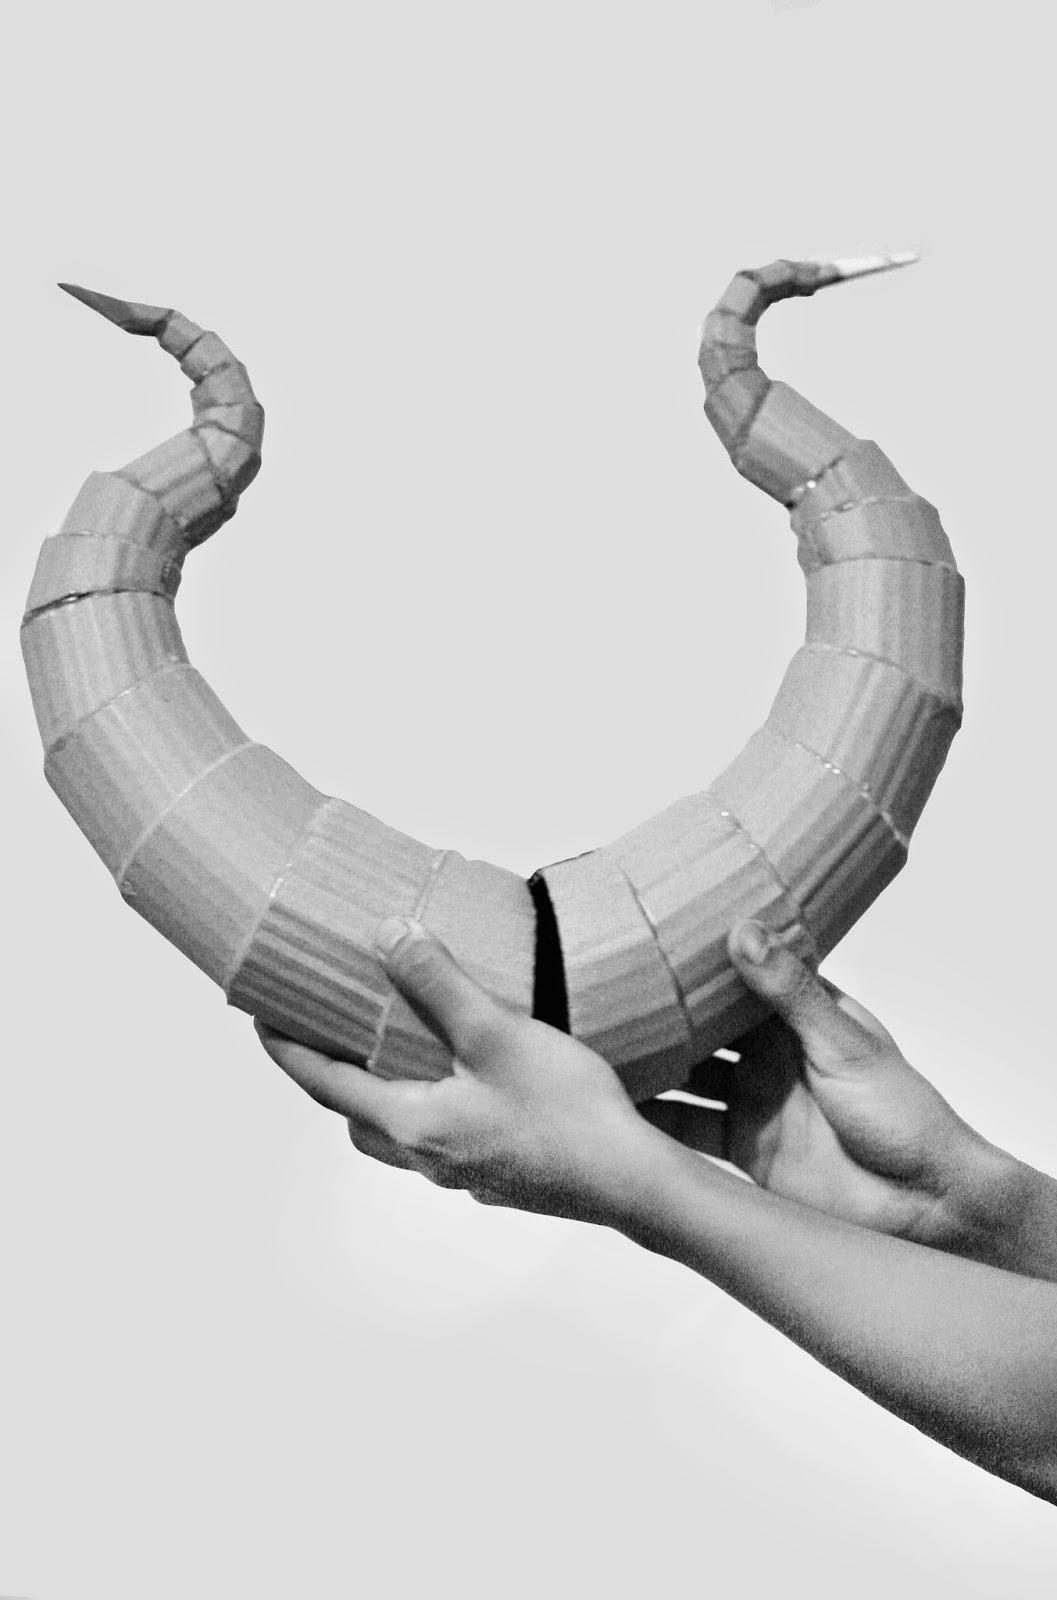 Best ideas about DIY Maleficent Horns . Save or Pin oishari DIY Lightweight Costume Horns Now.